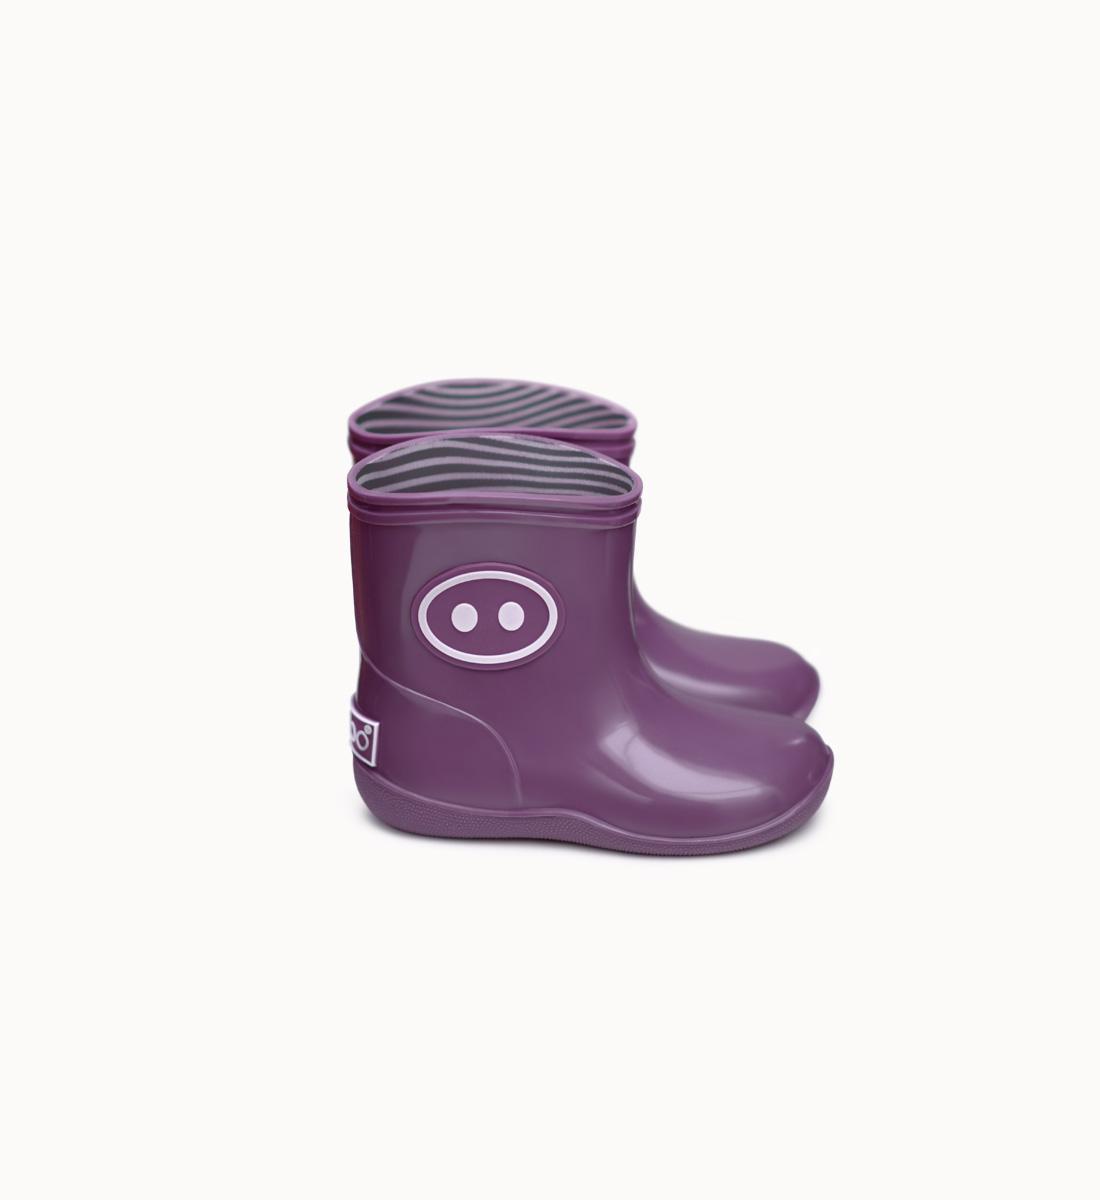 BOXBO 法國時尚雨靴 / 寶寶時尚雨靴-櫻桃紫